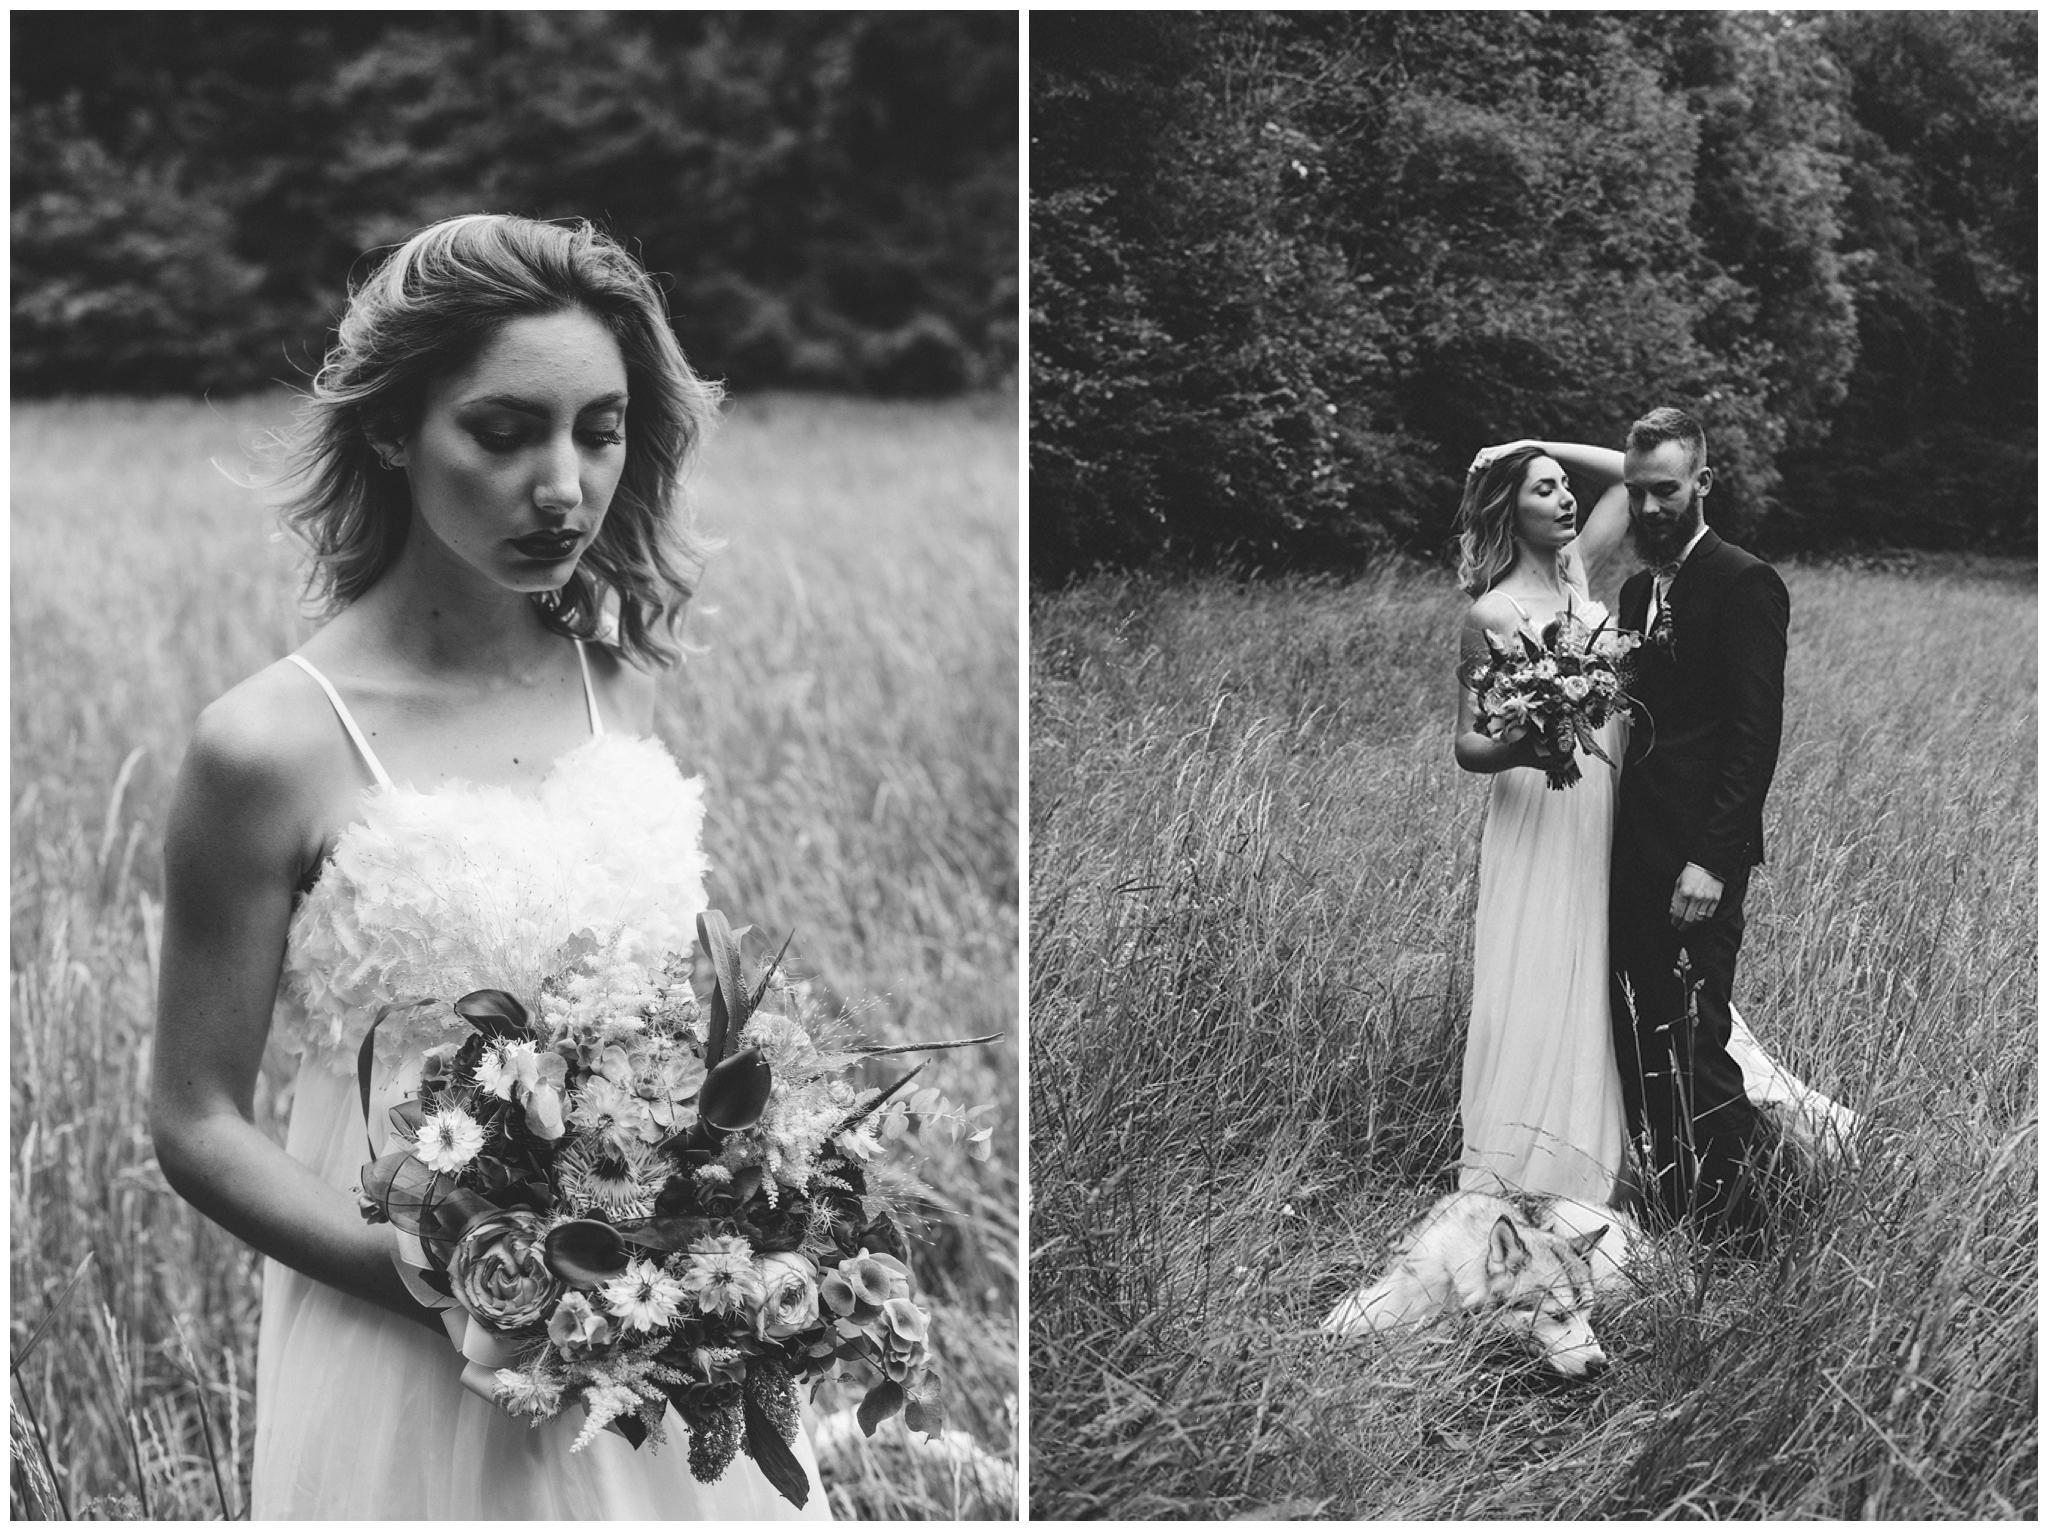 photographe-mariage-grenoble-annecy-lyon-shooting-inspiration-boheme-047